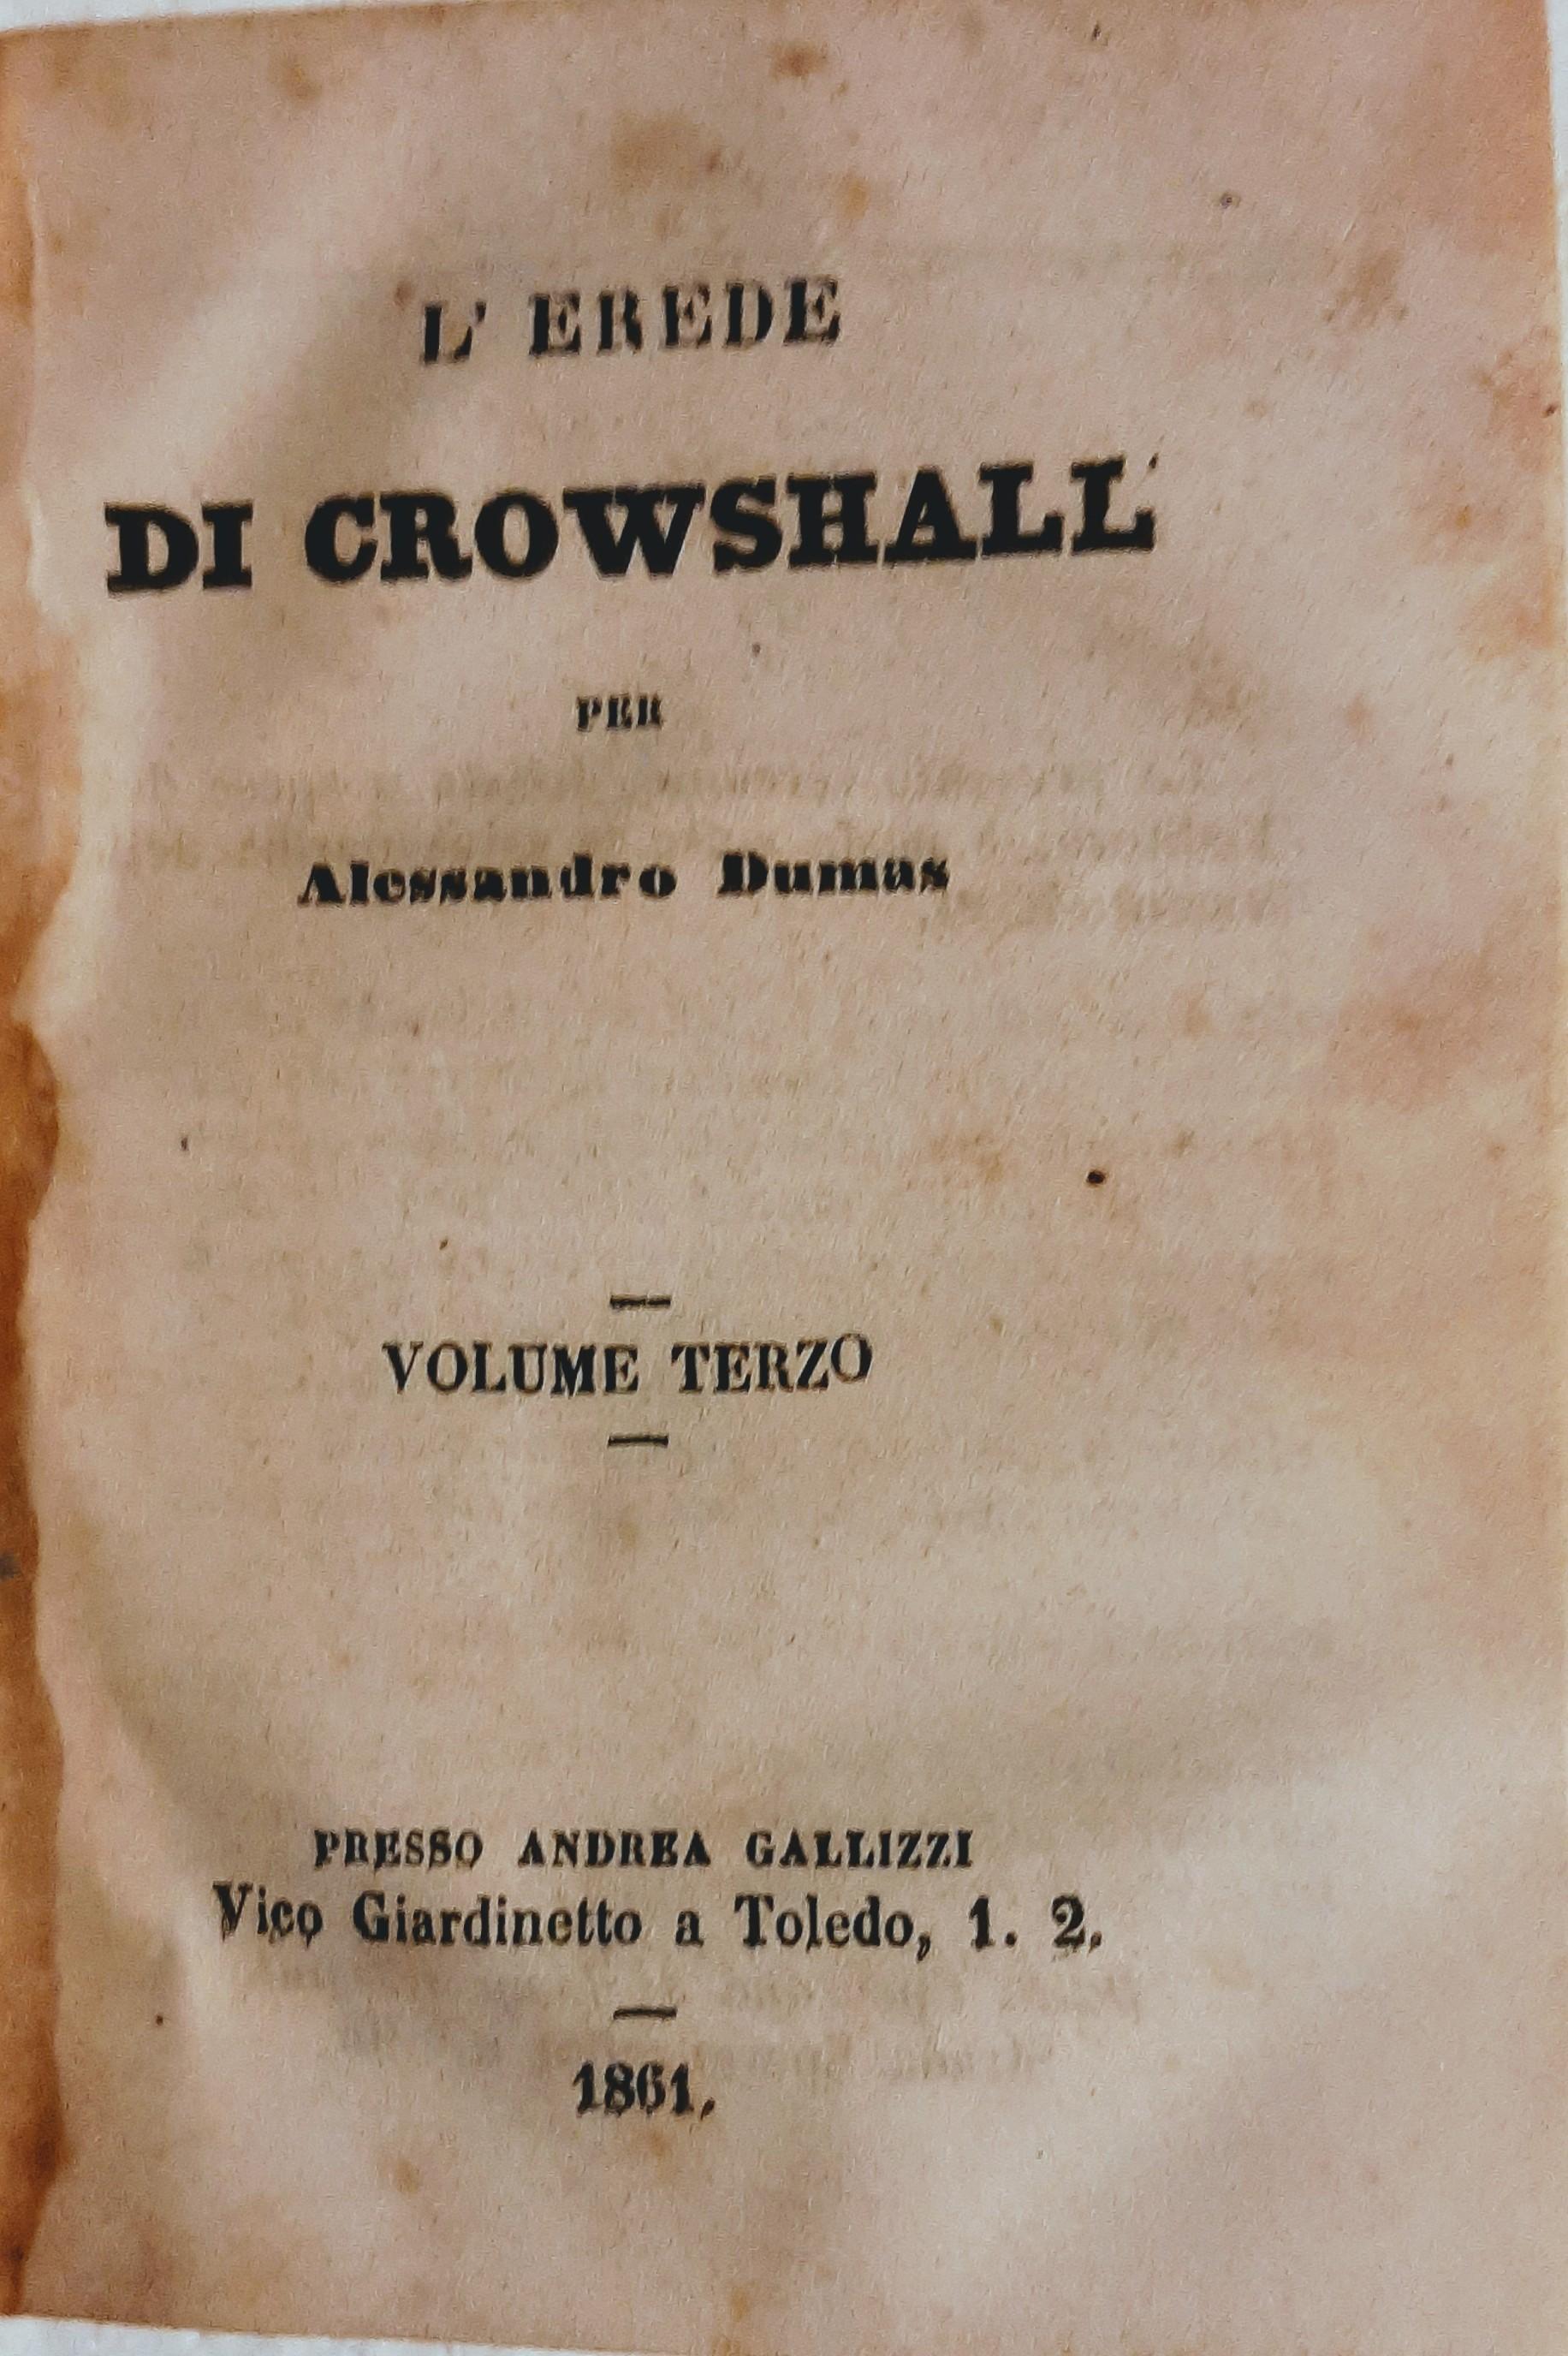 L'erede di Crowshall (vol. III)